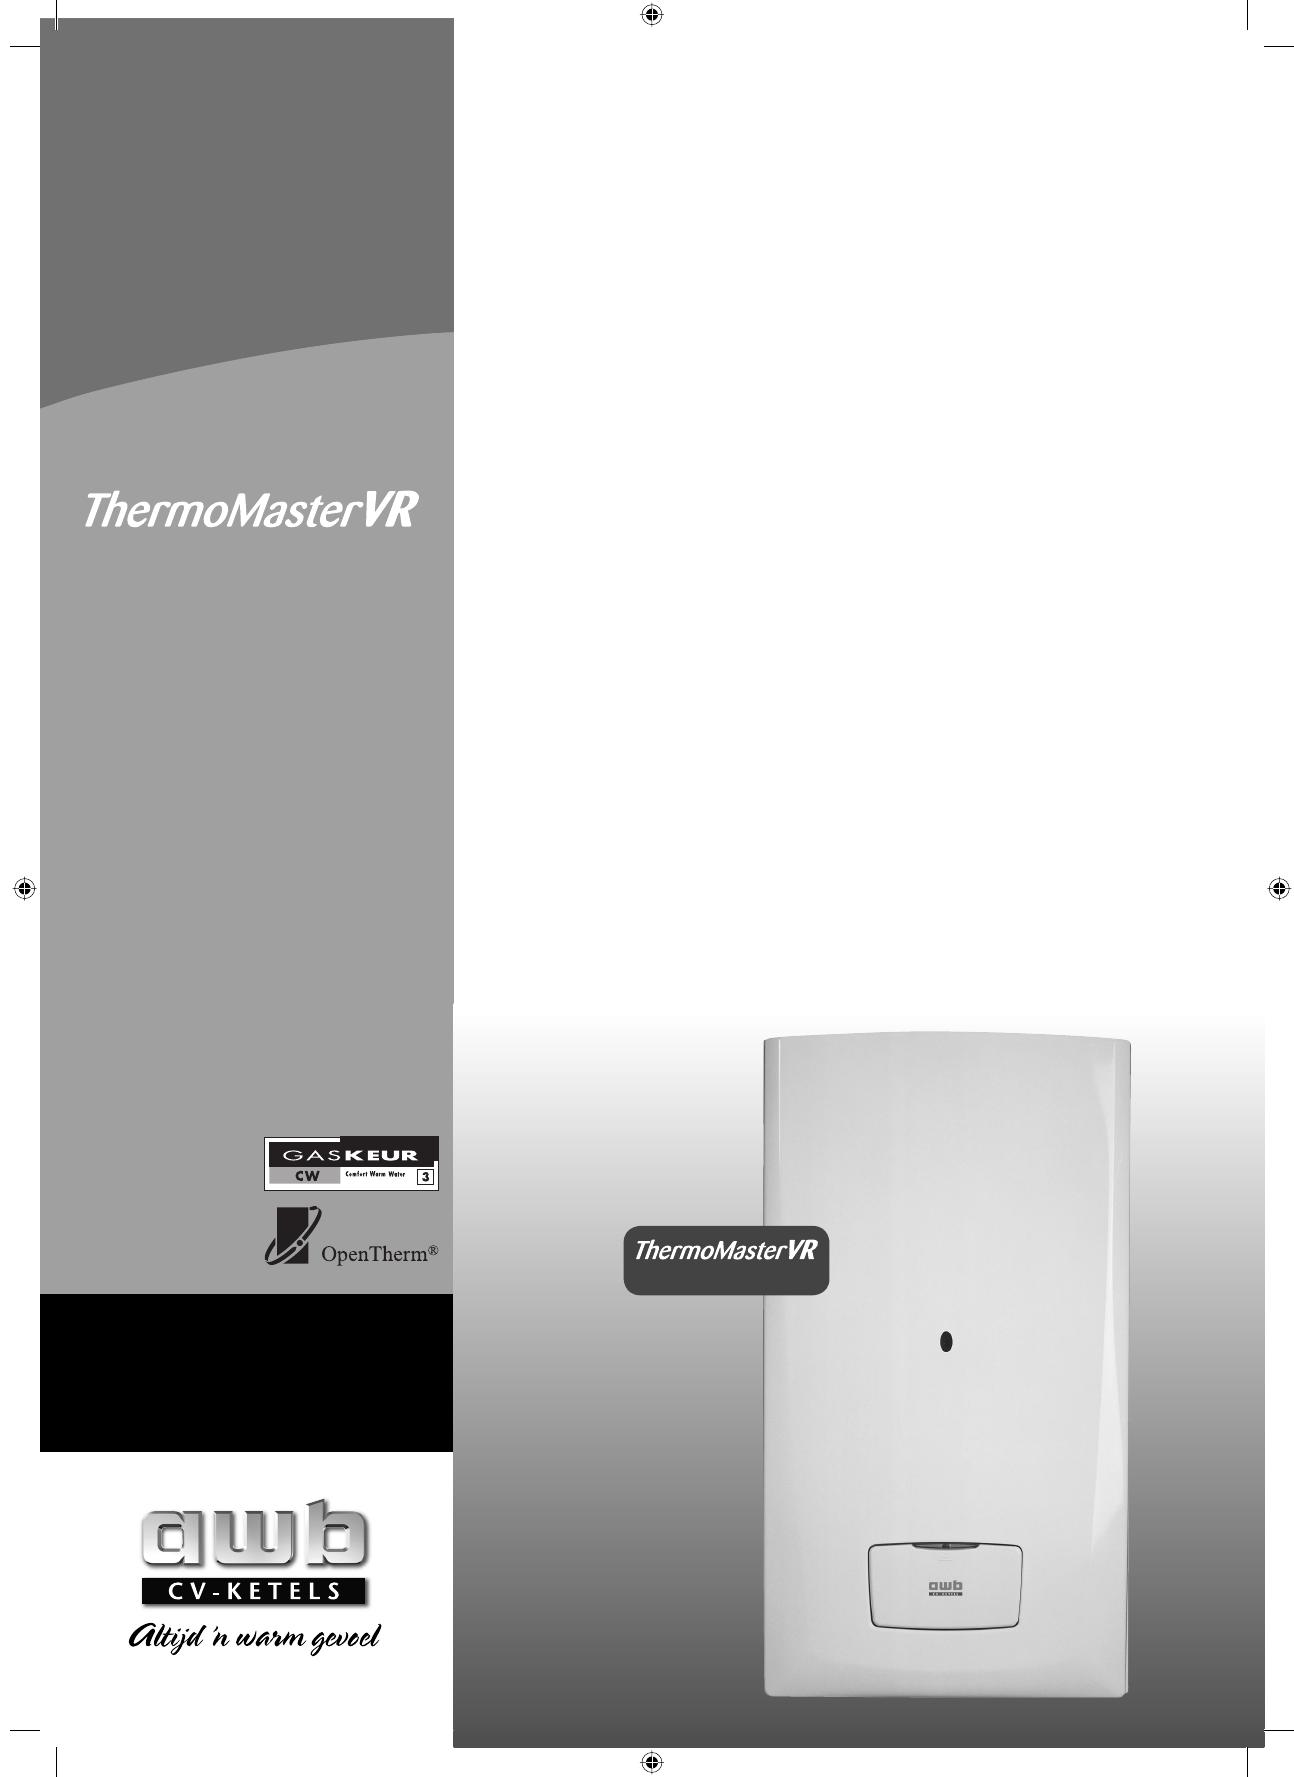 Goede Handleiding AWB Thermomaster VR 24T (pagina 1 van 24) (Nederlands) JI-82